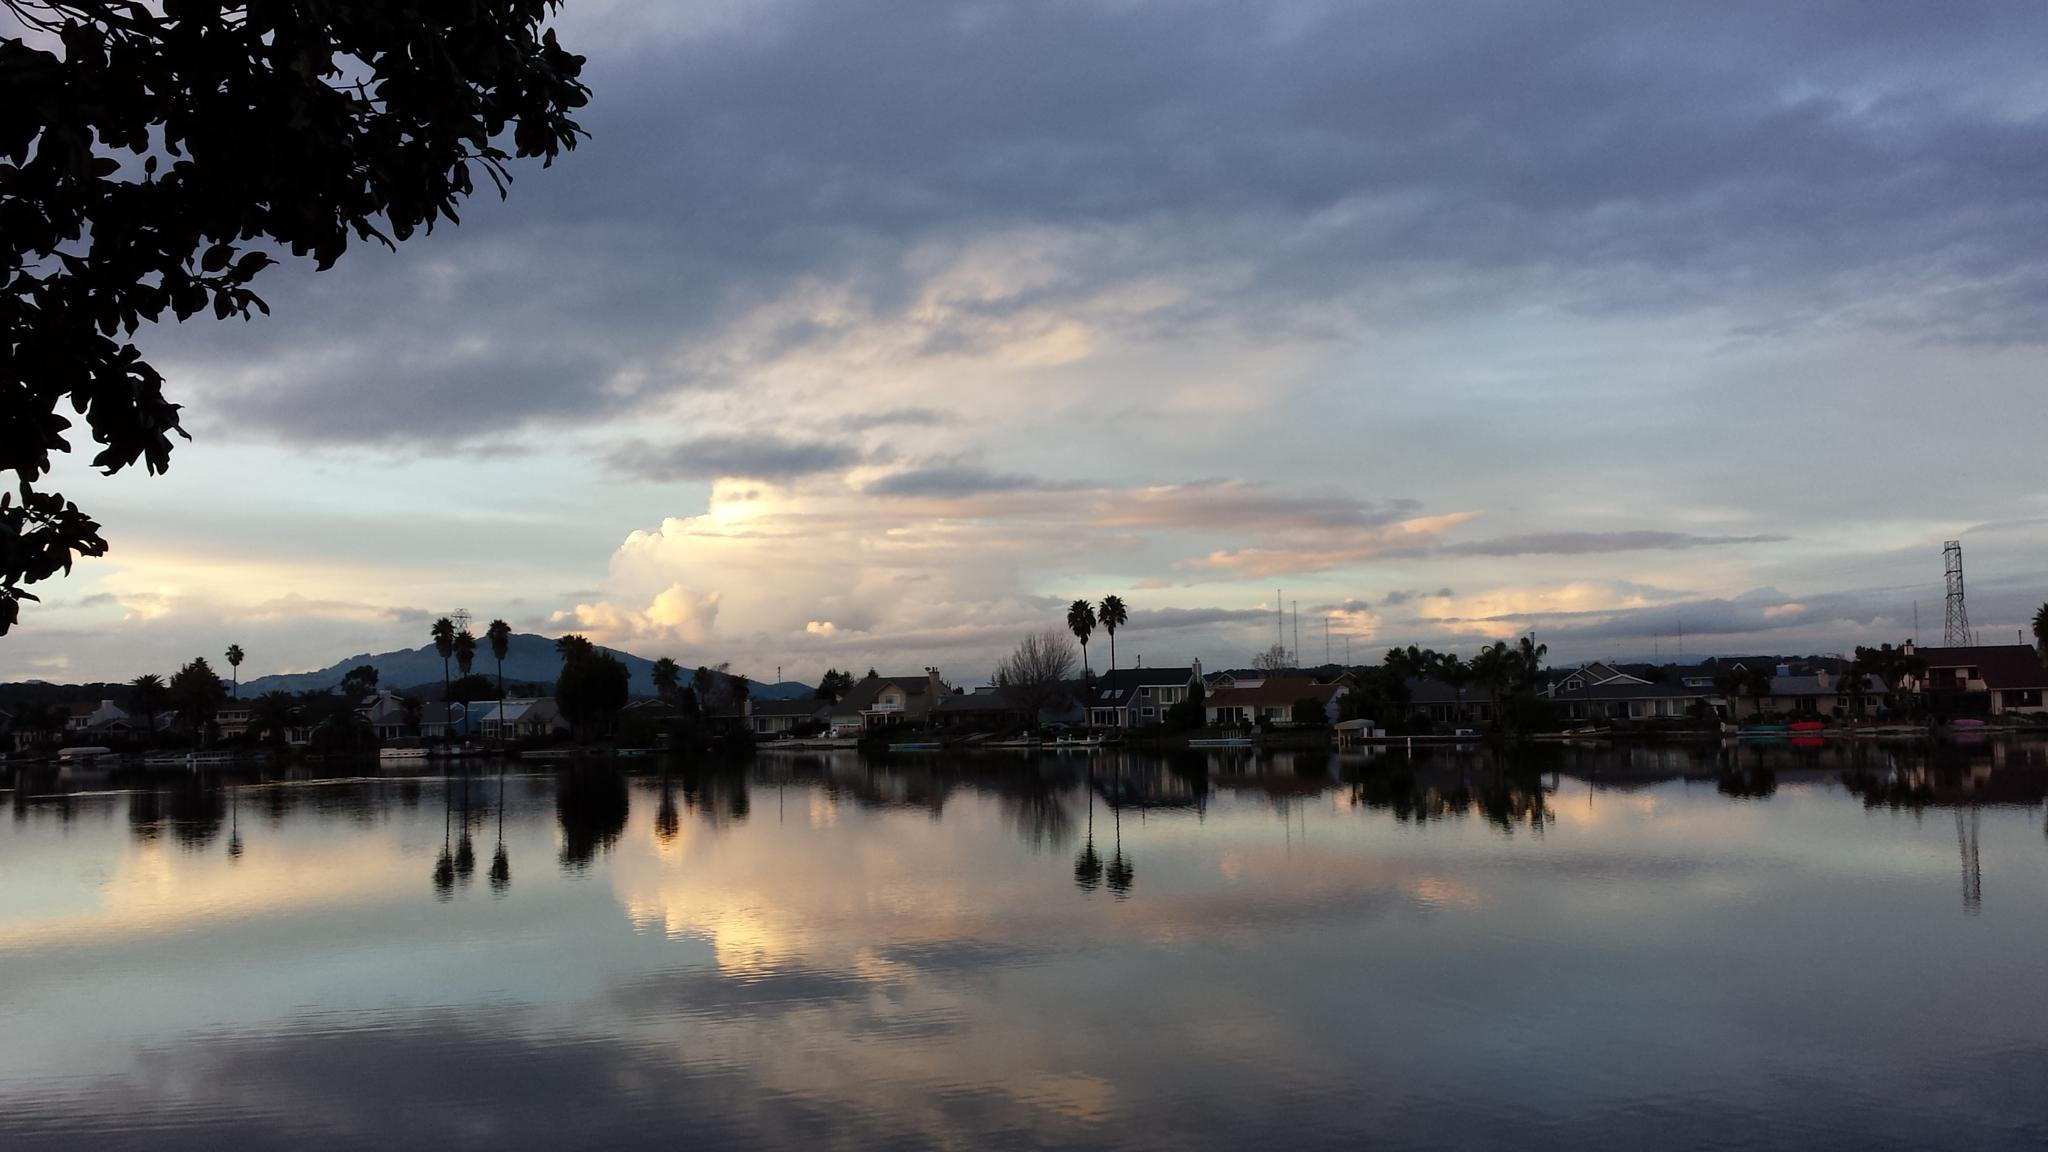 Backyard Reflections by Annie Molyneux